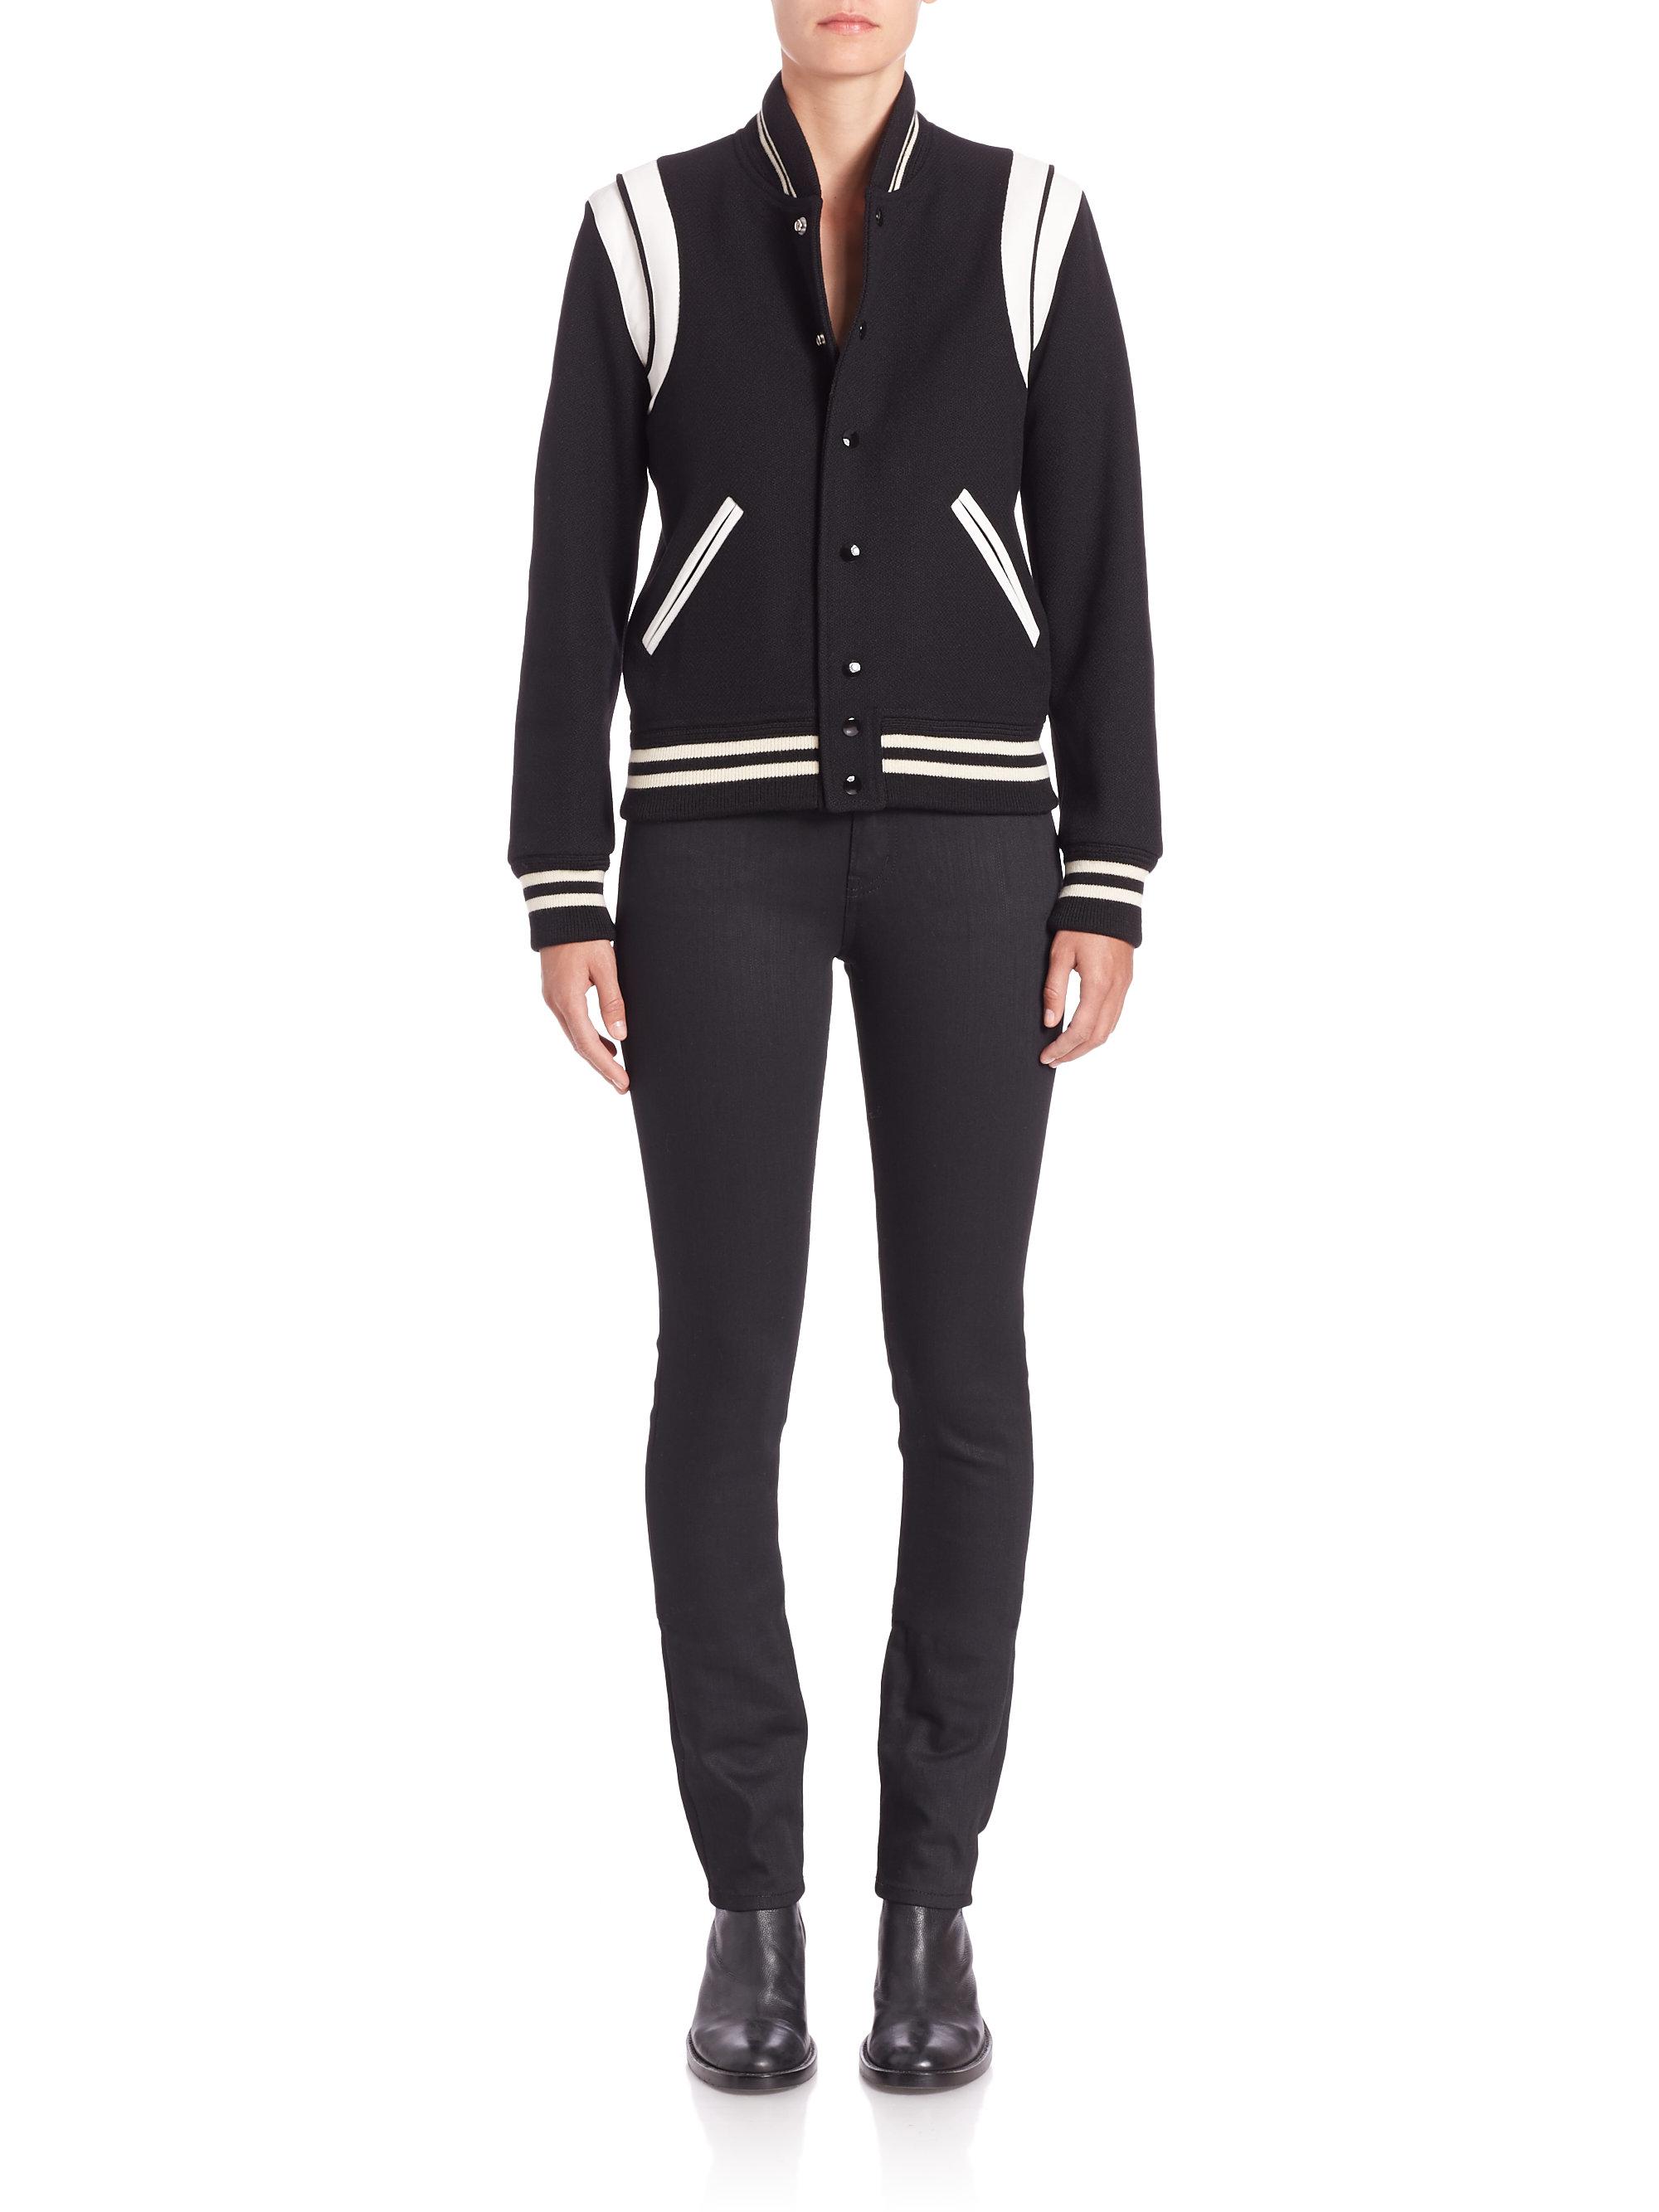 c37e6c07 Saint Laurent Black Teddy Leather-Trimmed Wool Varsity Jacket